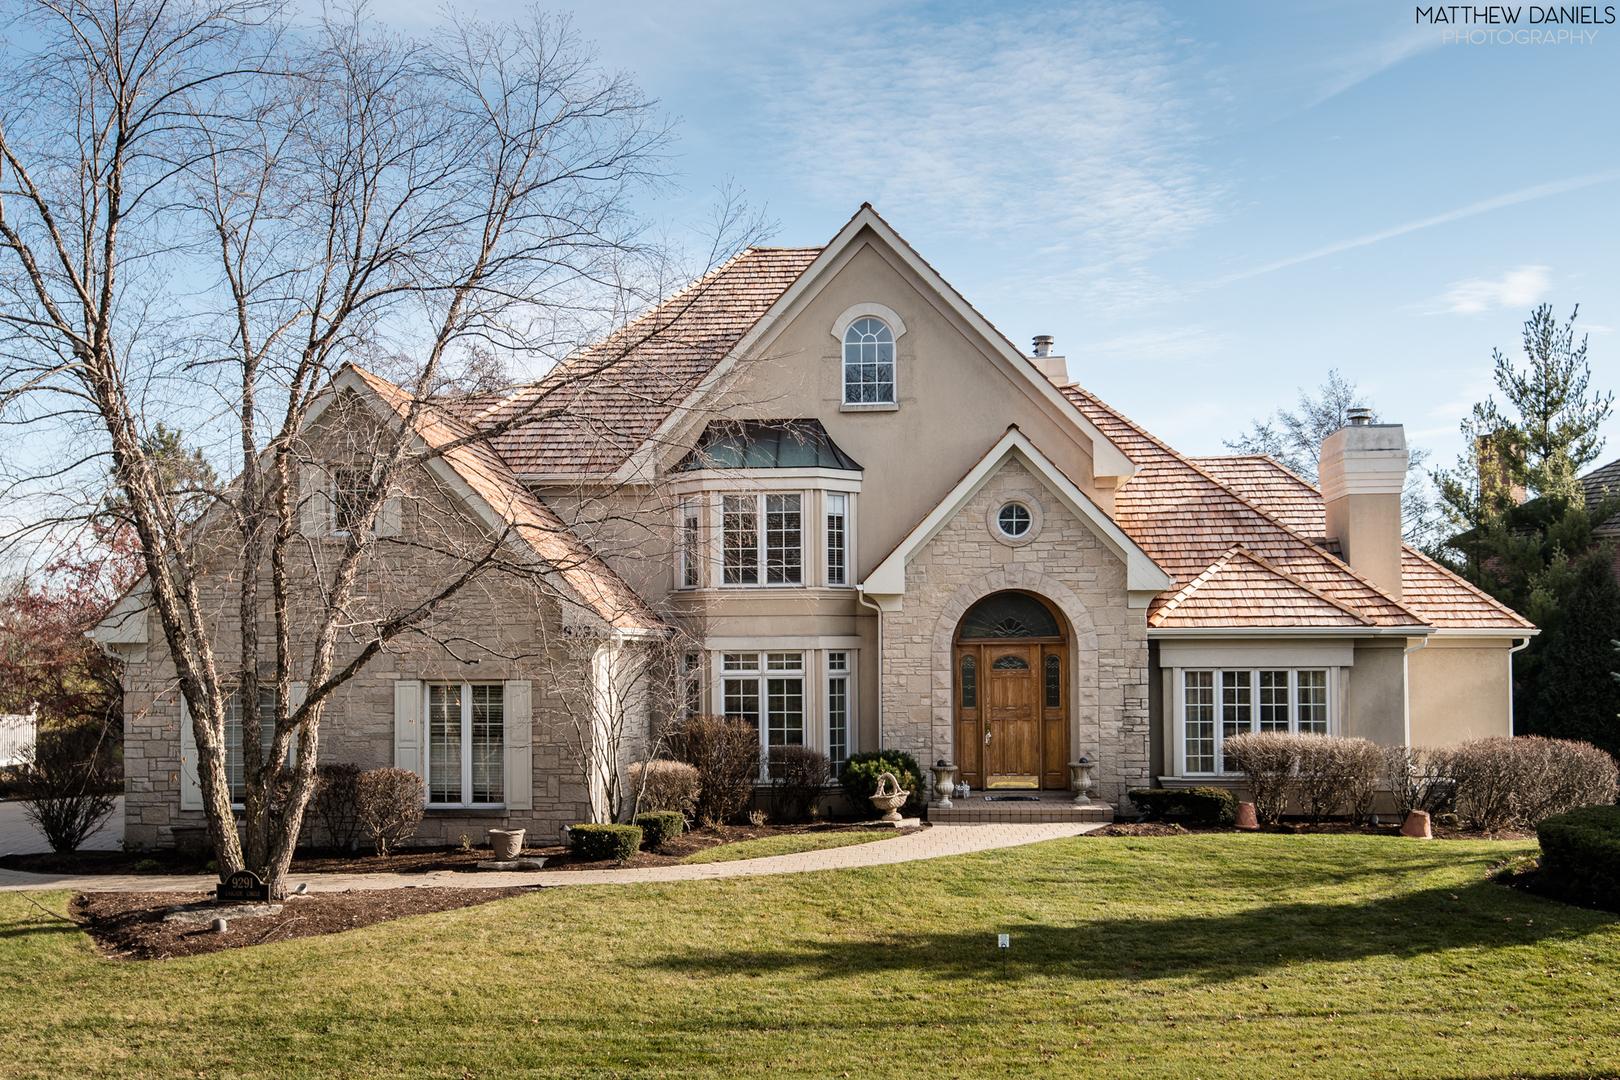 9291 Cascade, Burr Ridge, Illinois, 60527